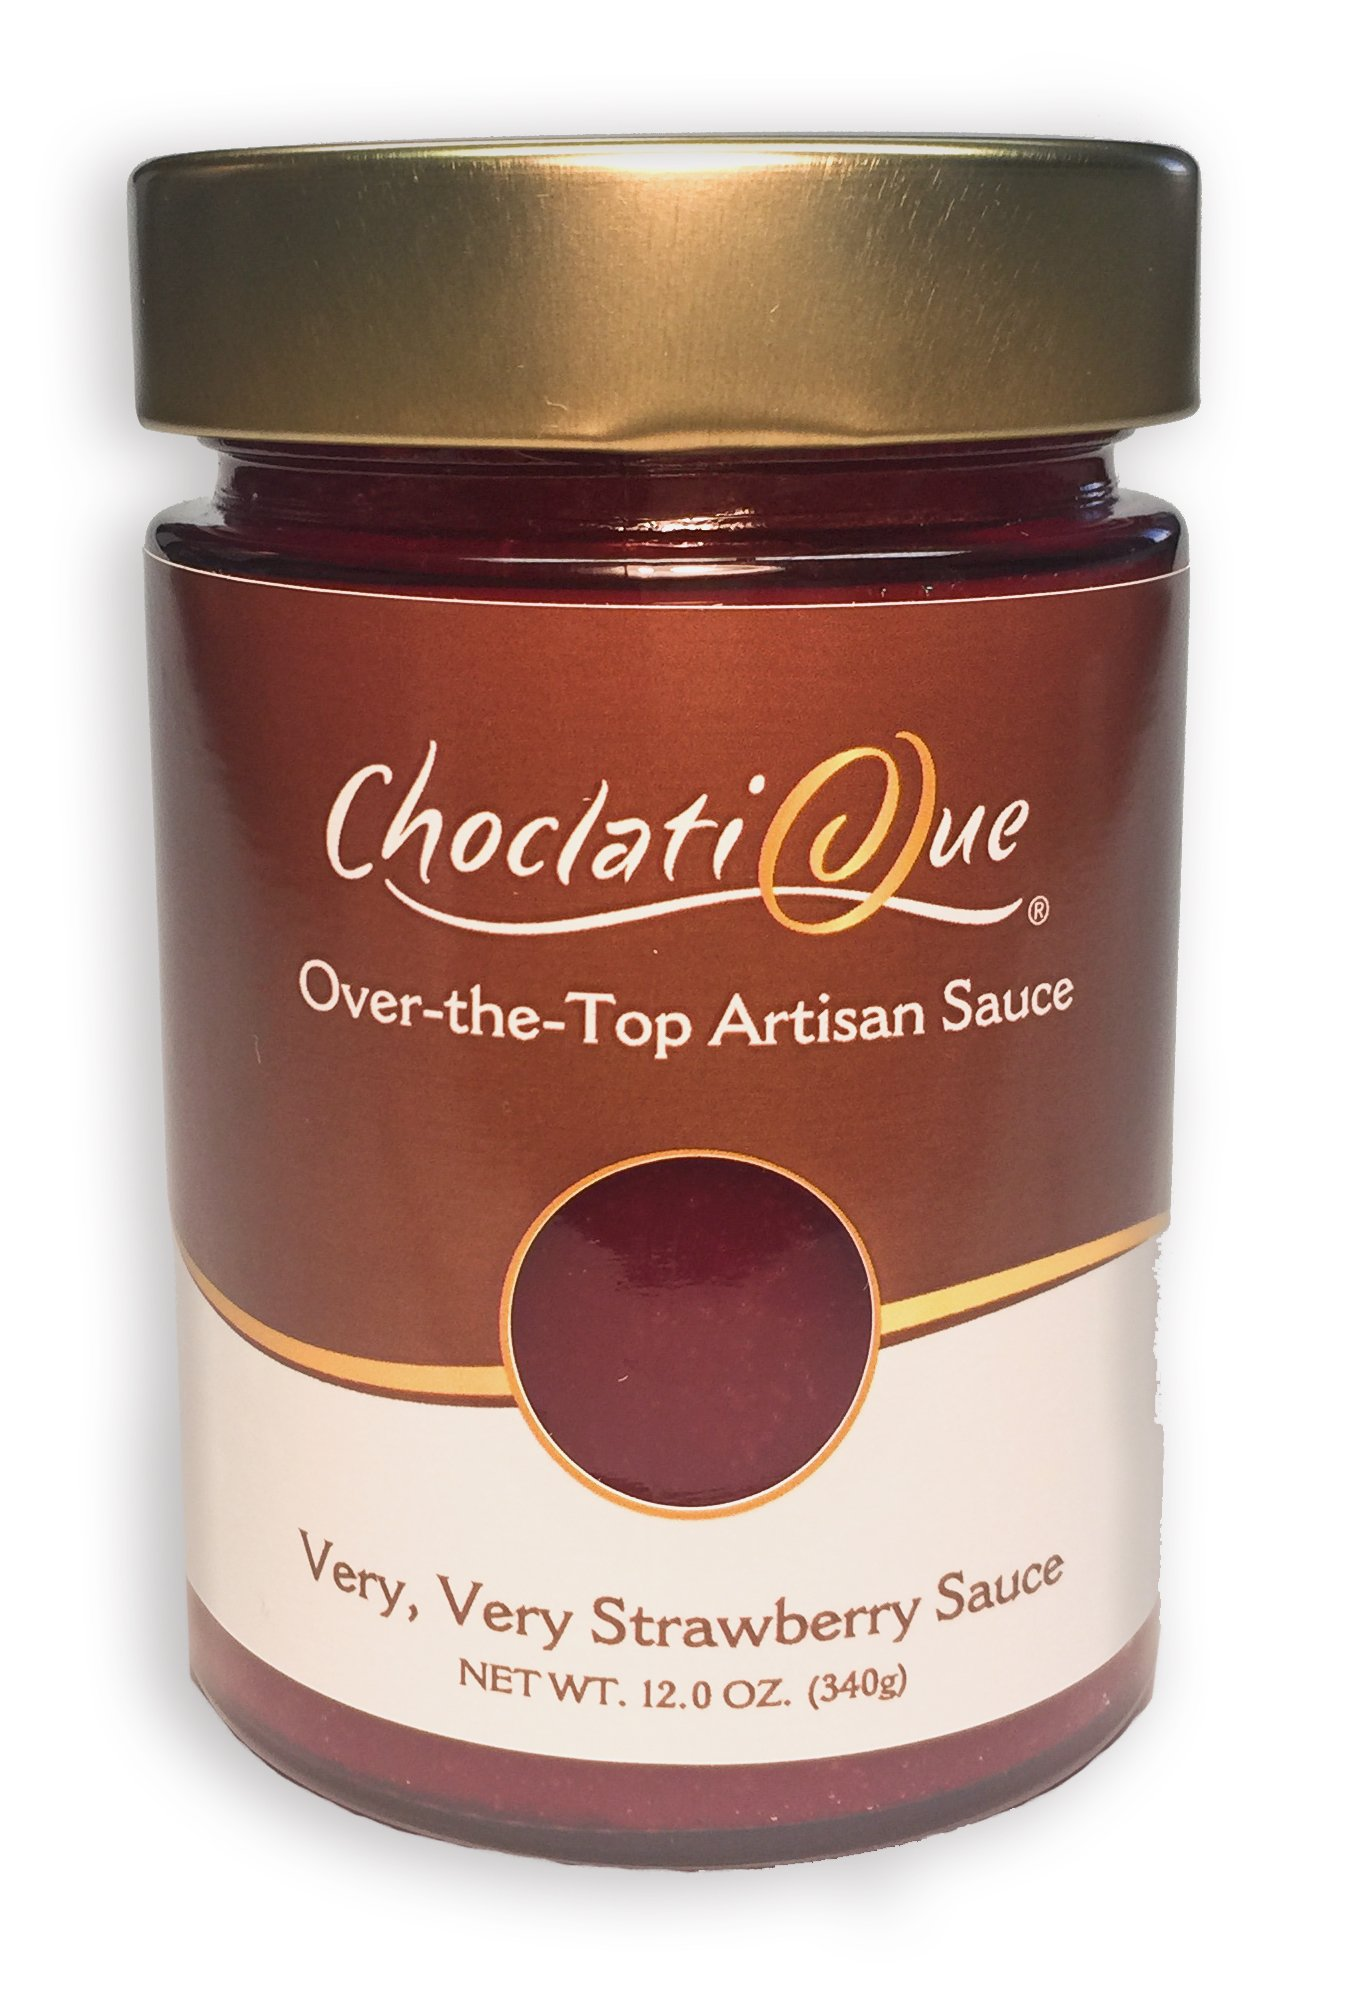 Very, Very Strawberry Sauce